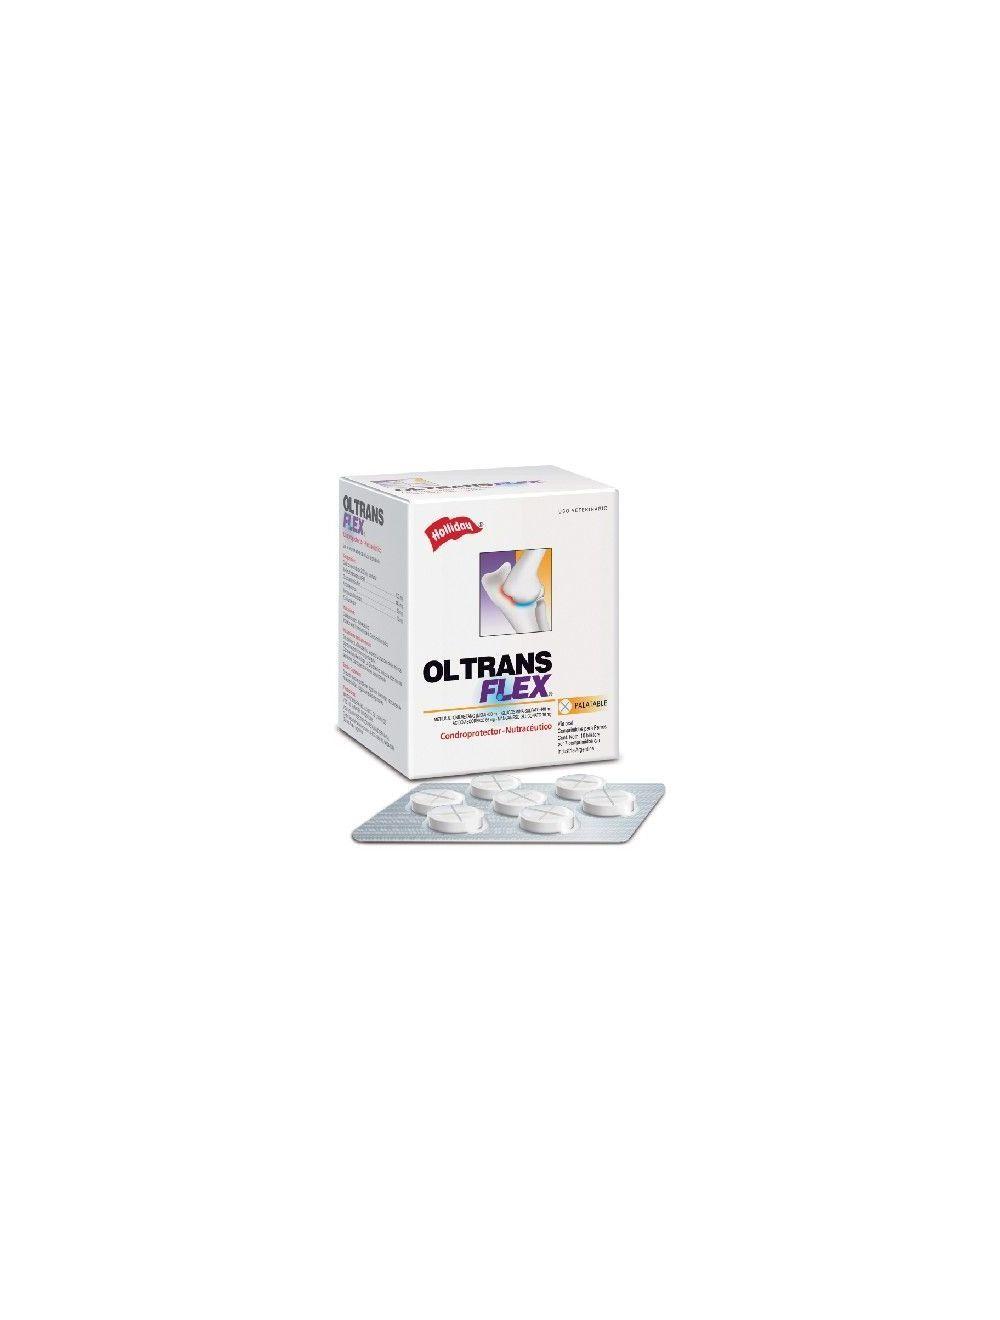 OL-trans flex suplemento vitamínico 7 tab - Ciudaddemascotas.com